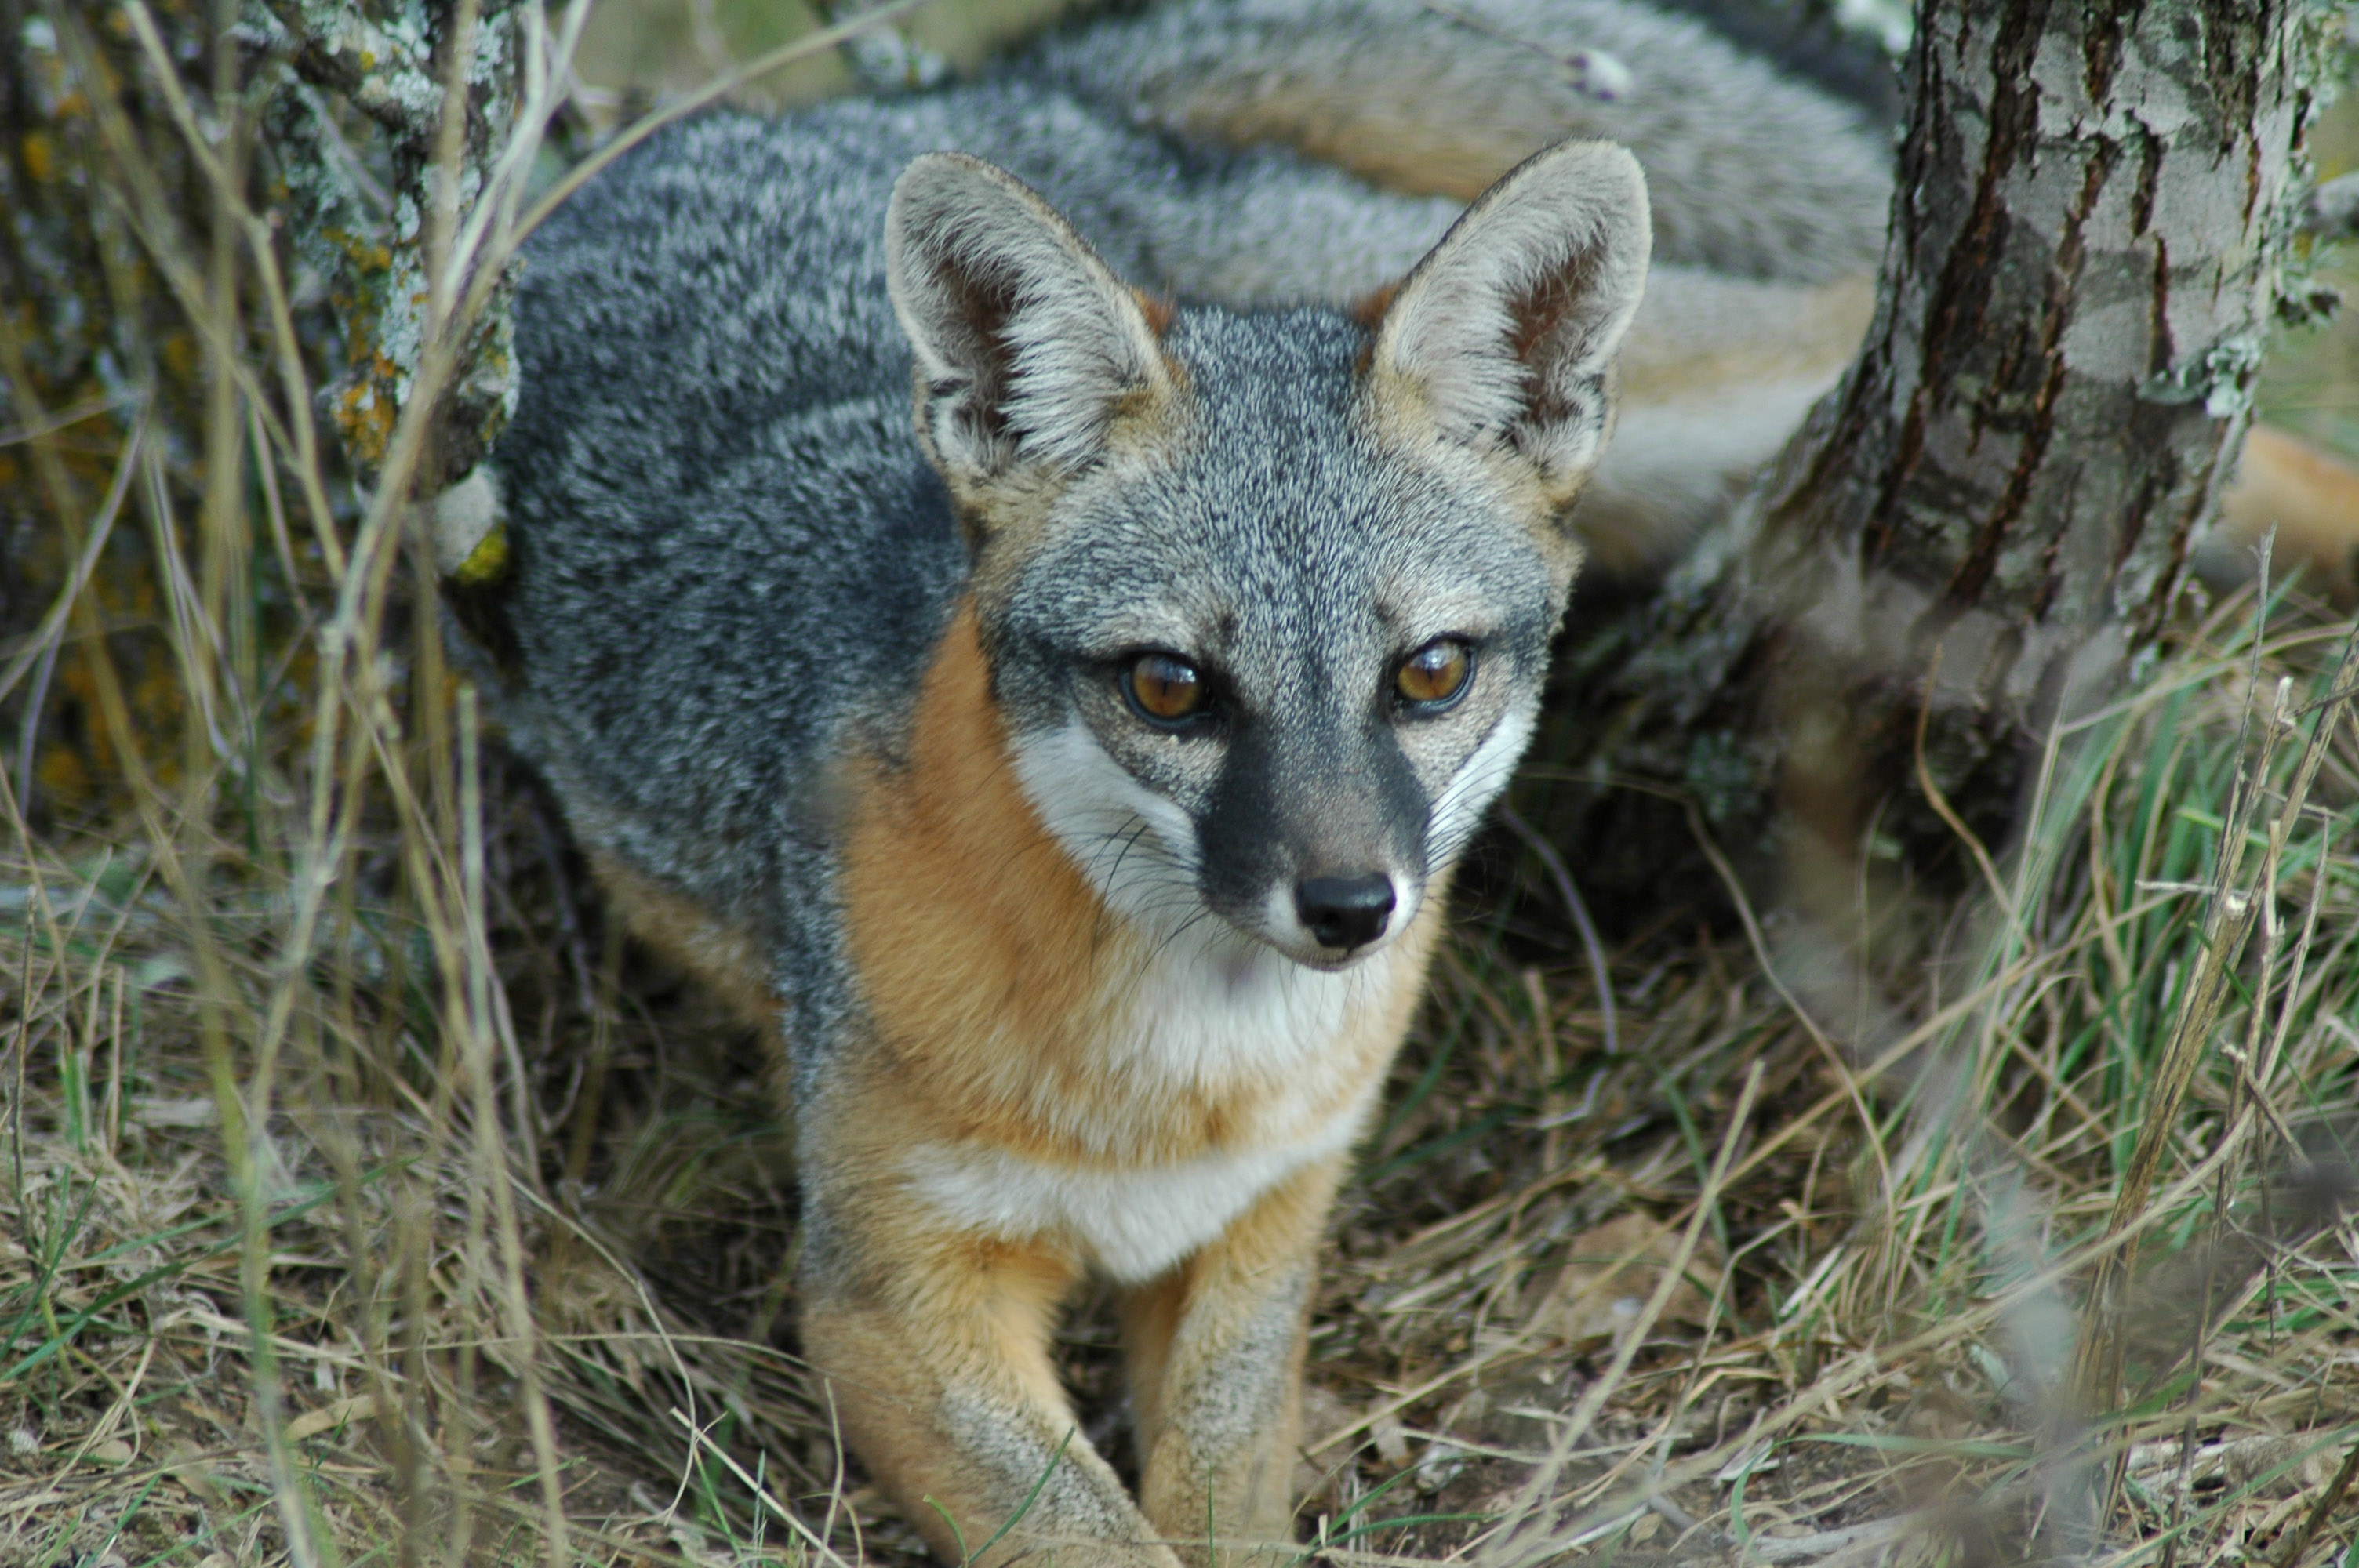 Good Samaritan in FLORIDA helps with injured FOX and may ...